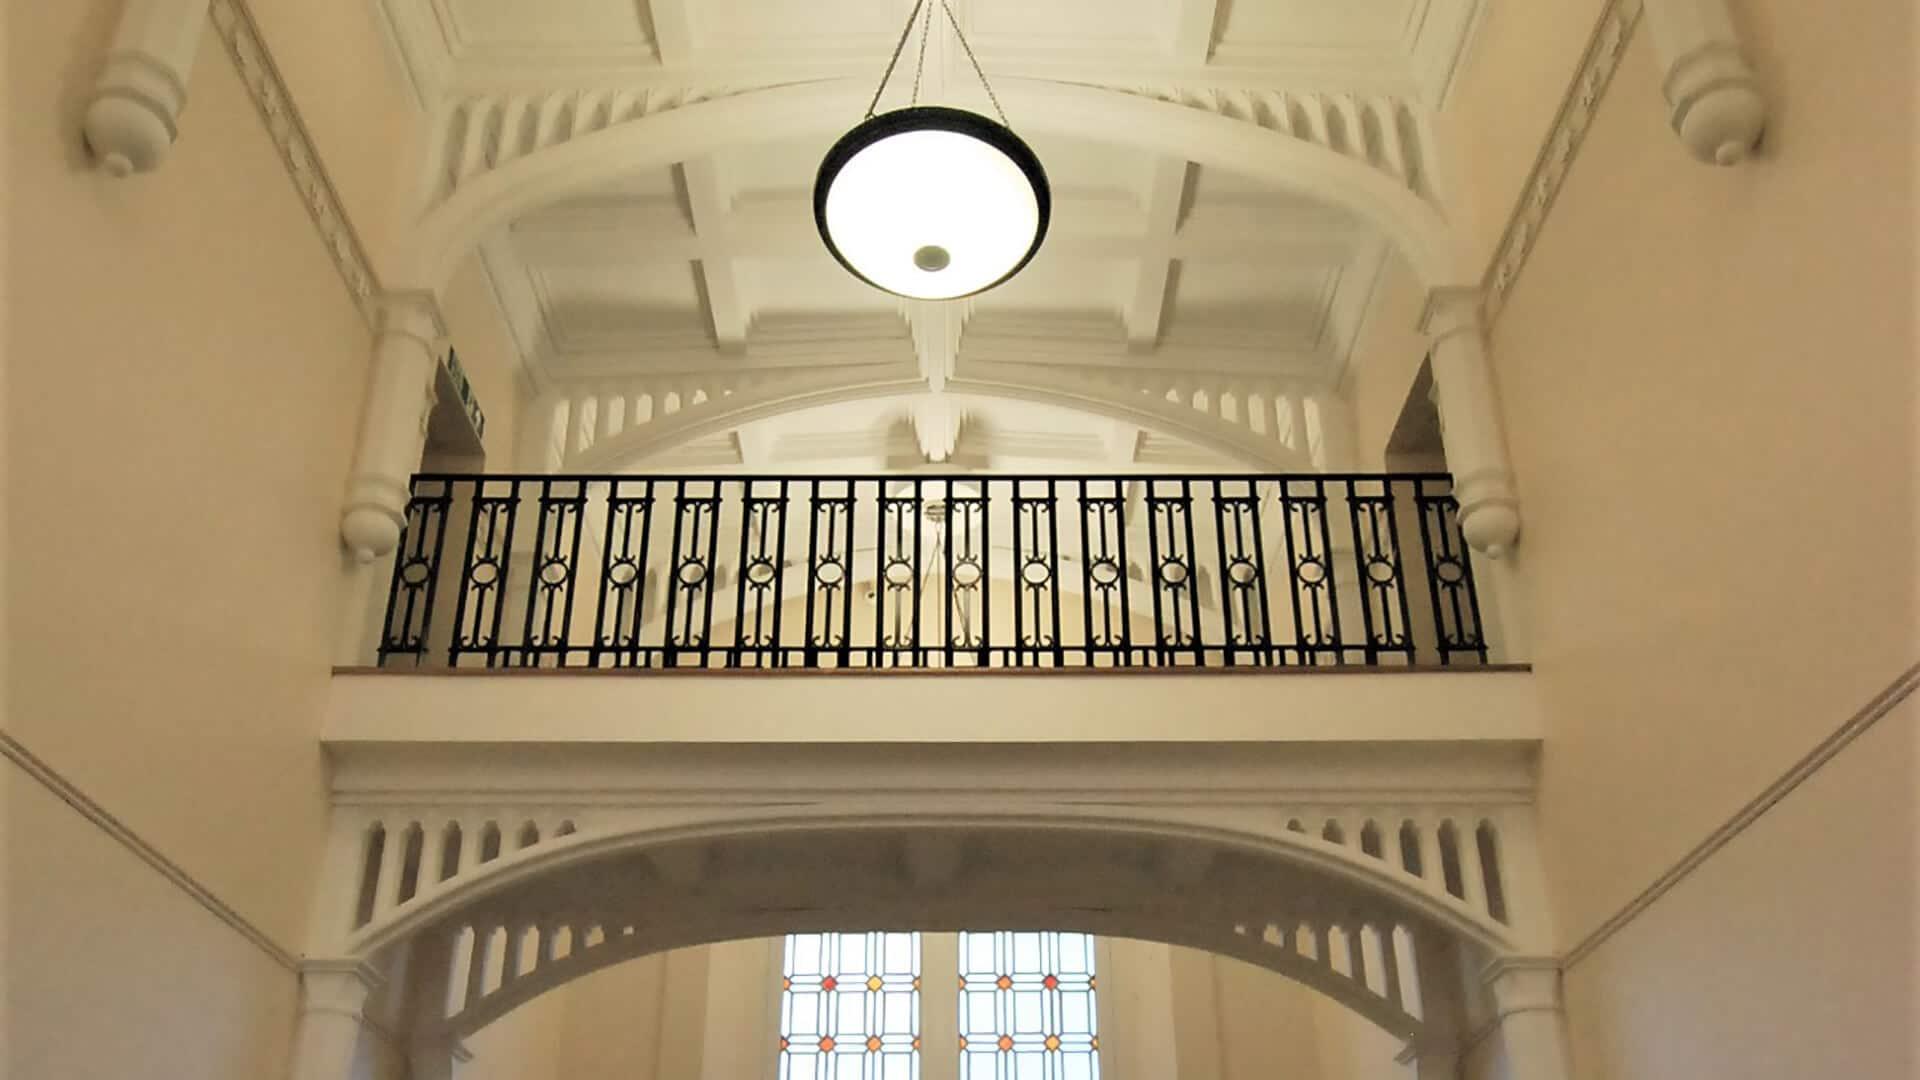 St Andrews University st salvators quad school